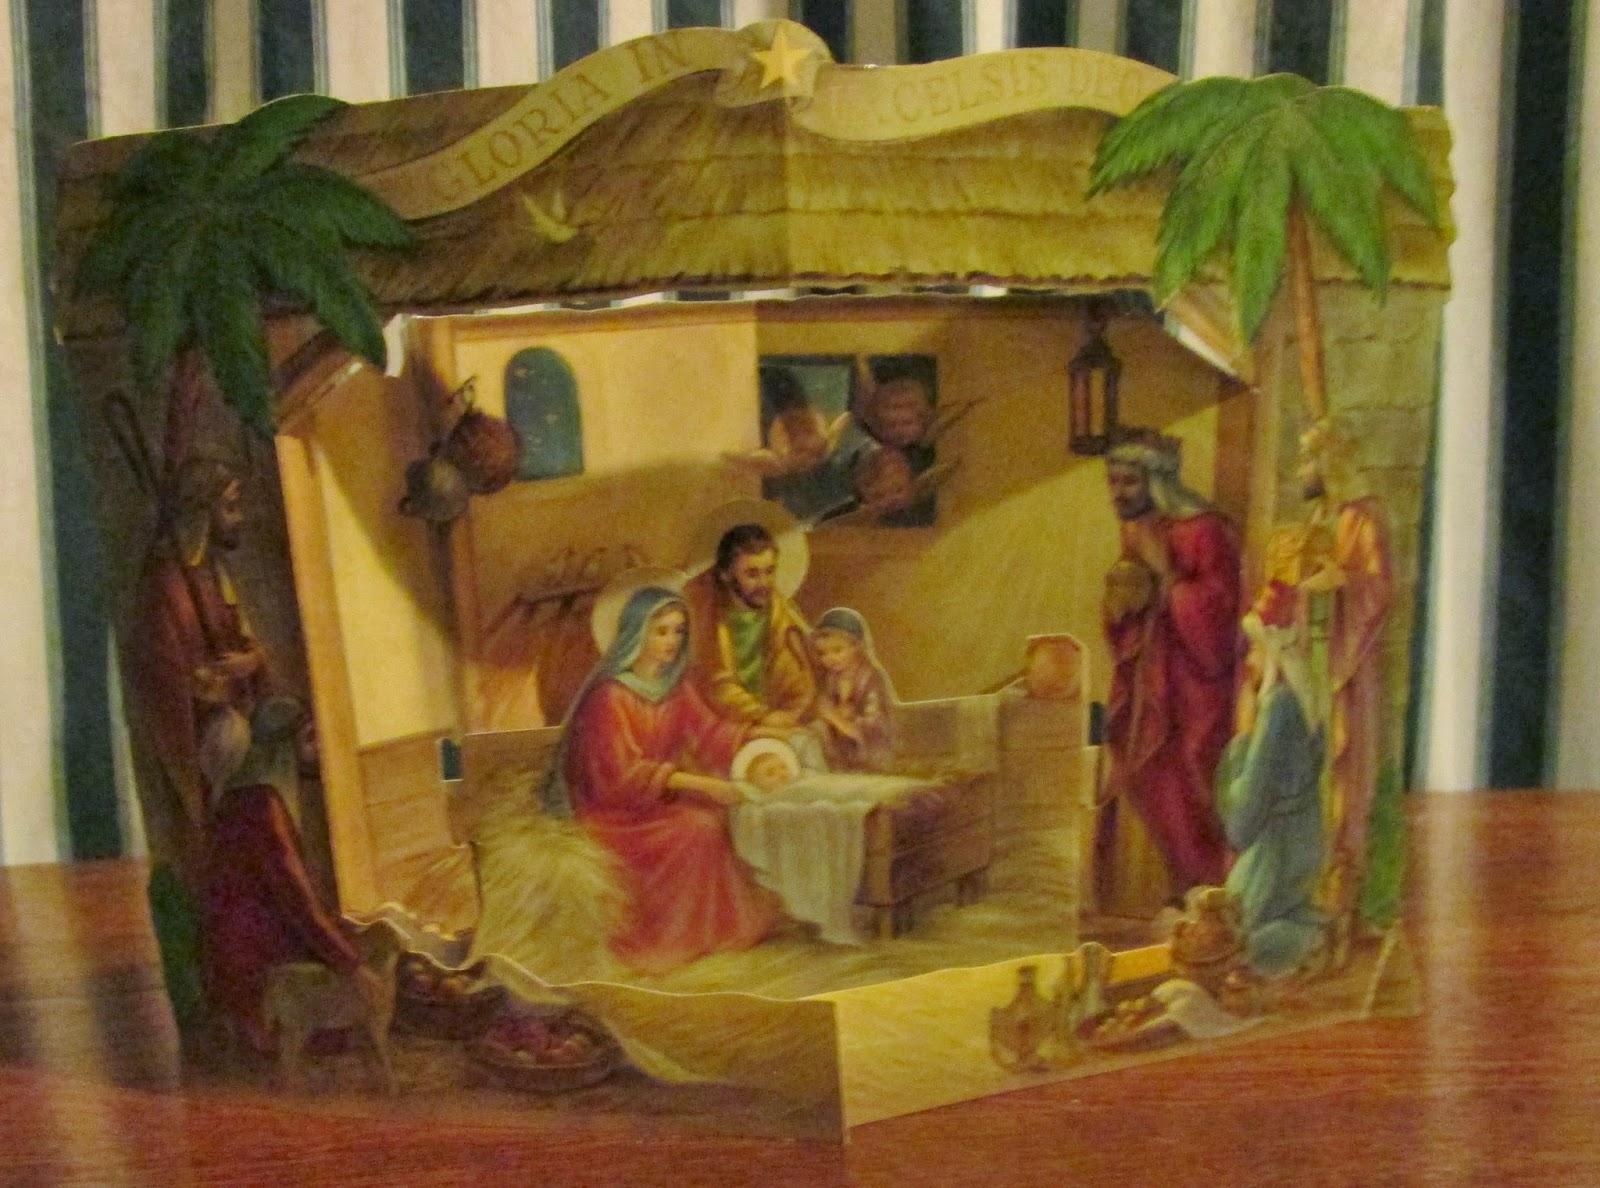 The Estate Sale Chronicles The Vintage Paper Nativity Scenes